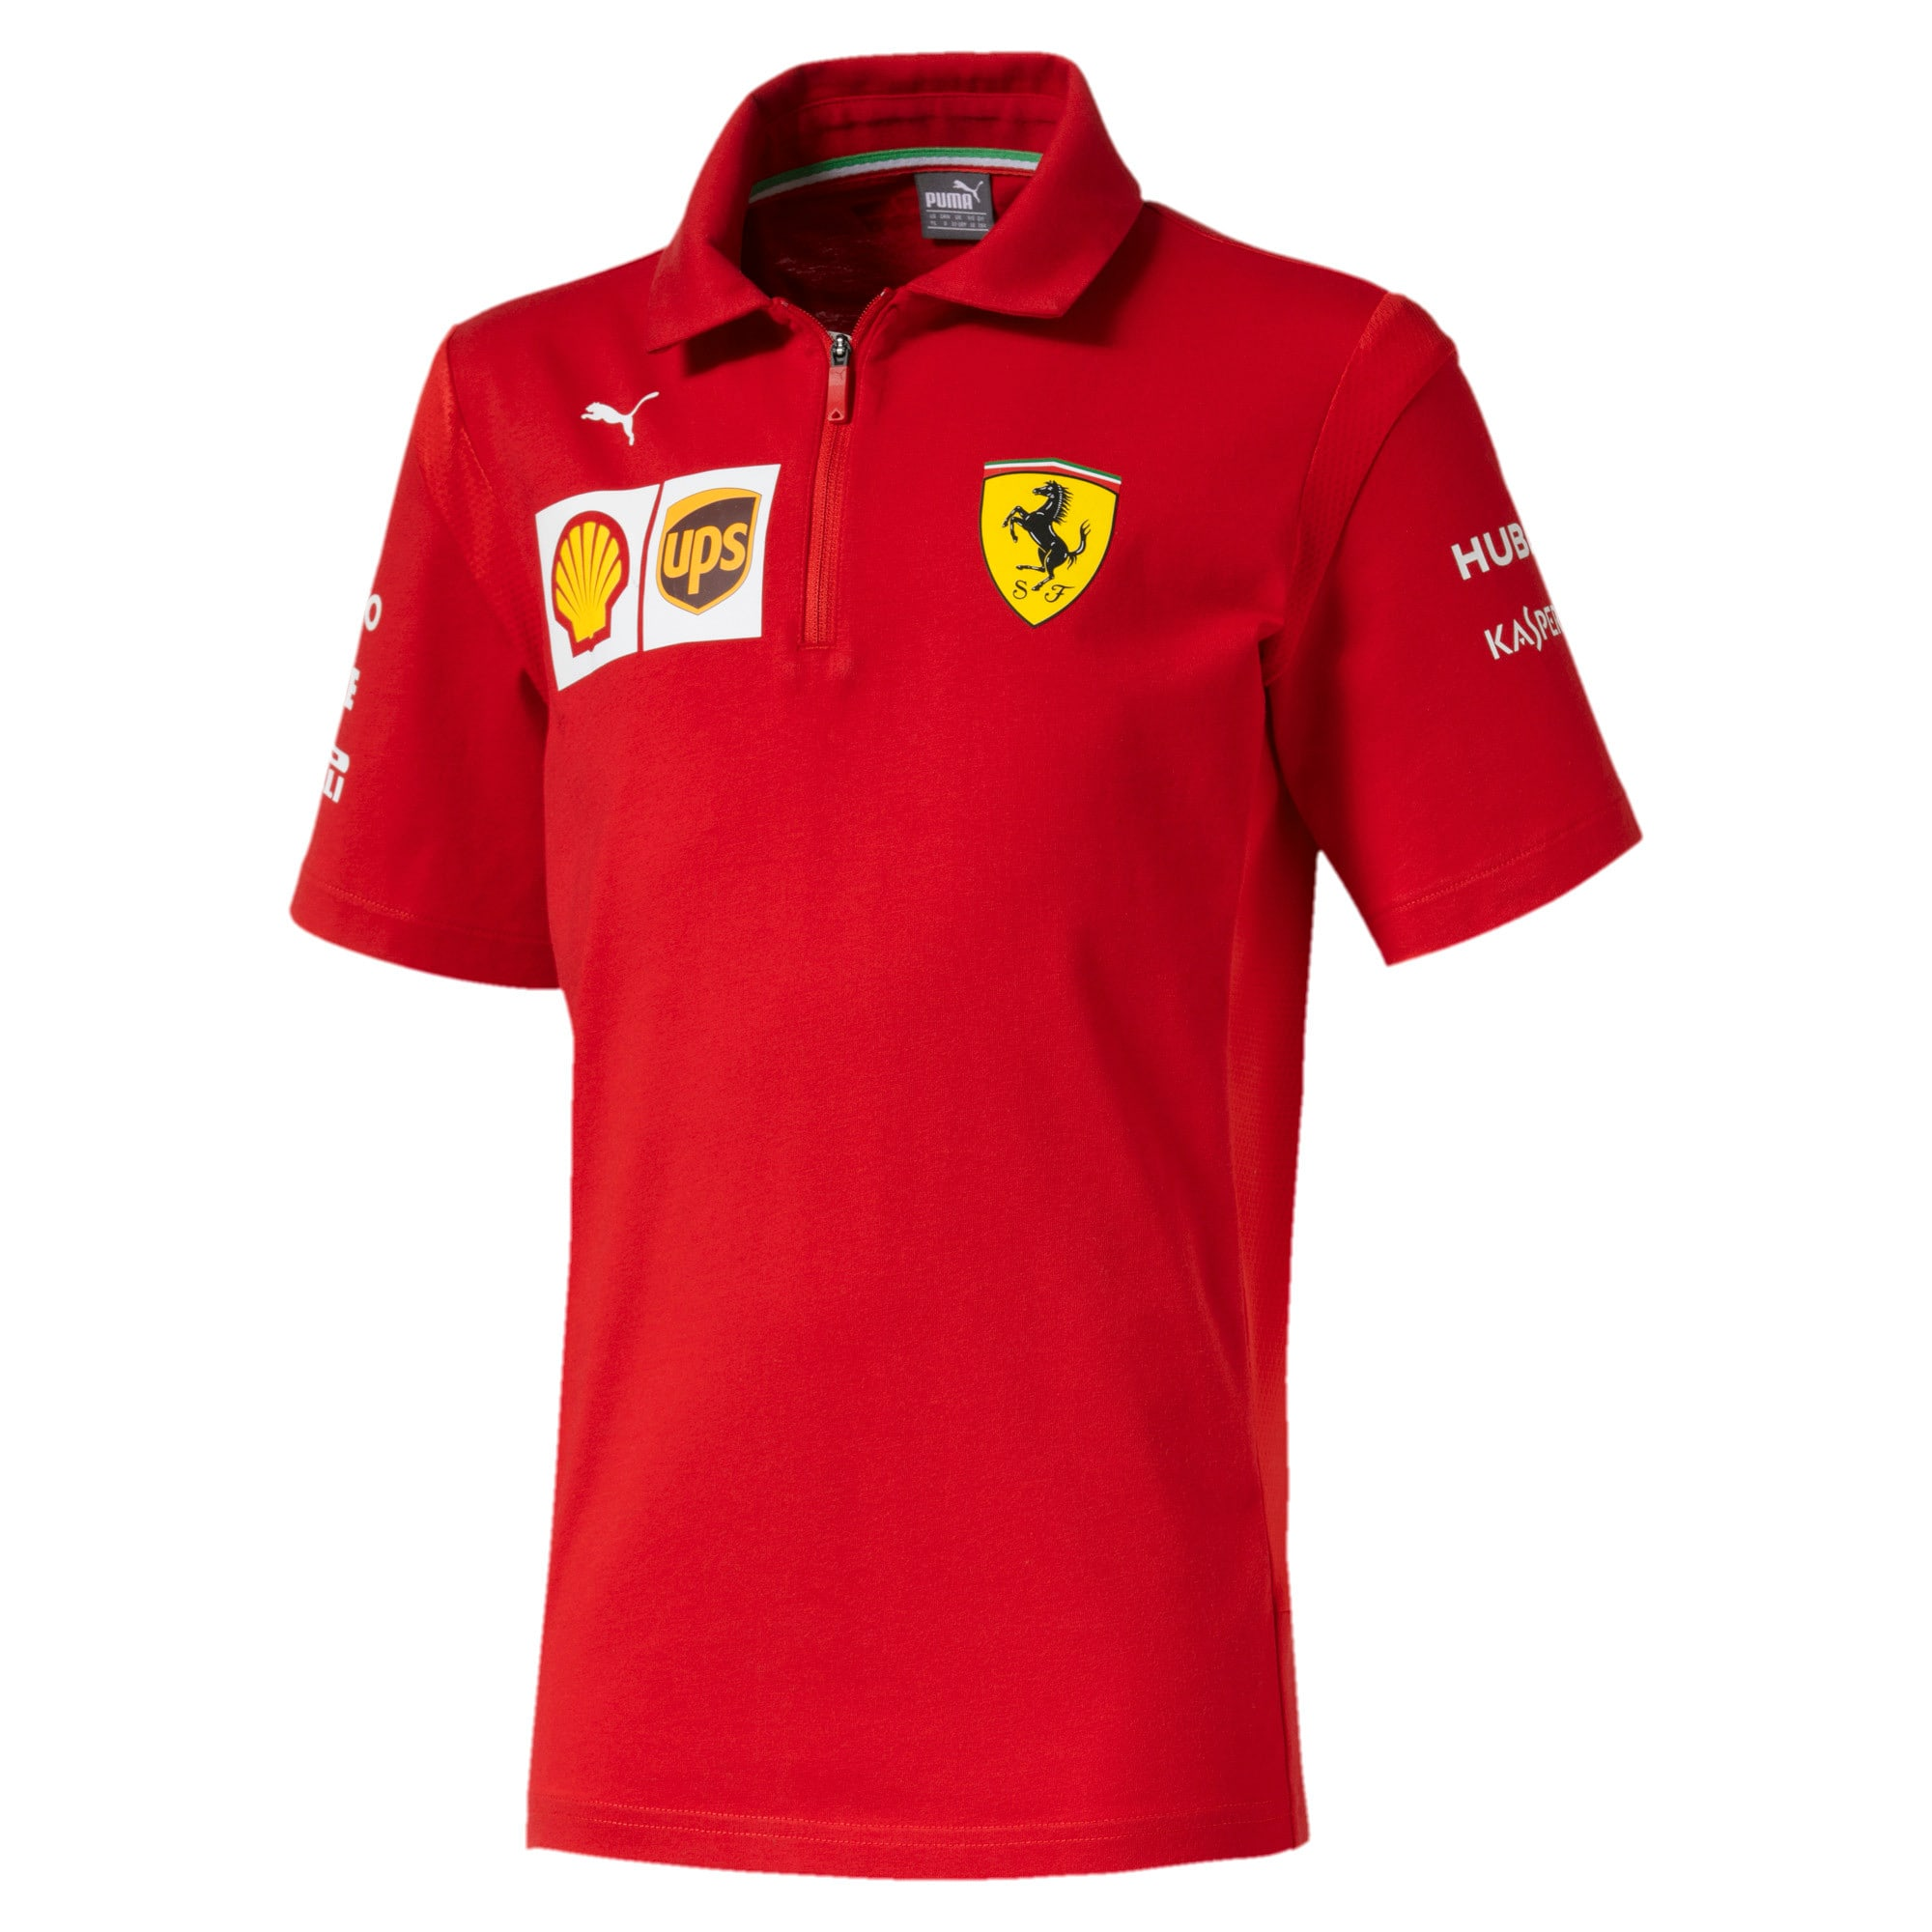 Thumbnail 1 of Polo Ferrari Team pour garçon, Rosso Corsa, medium